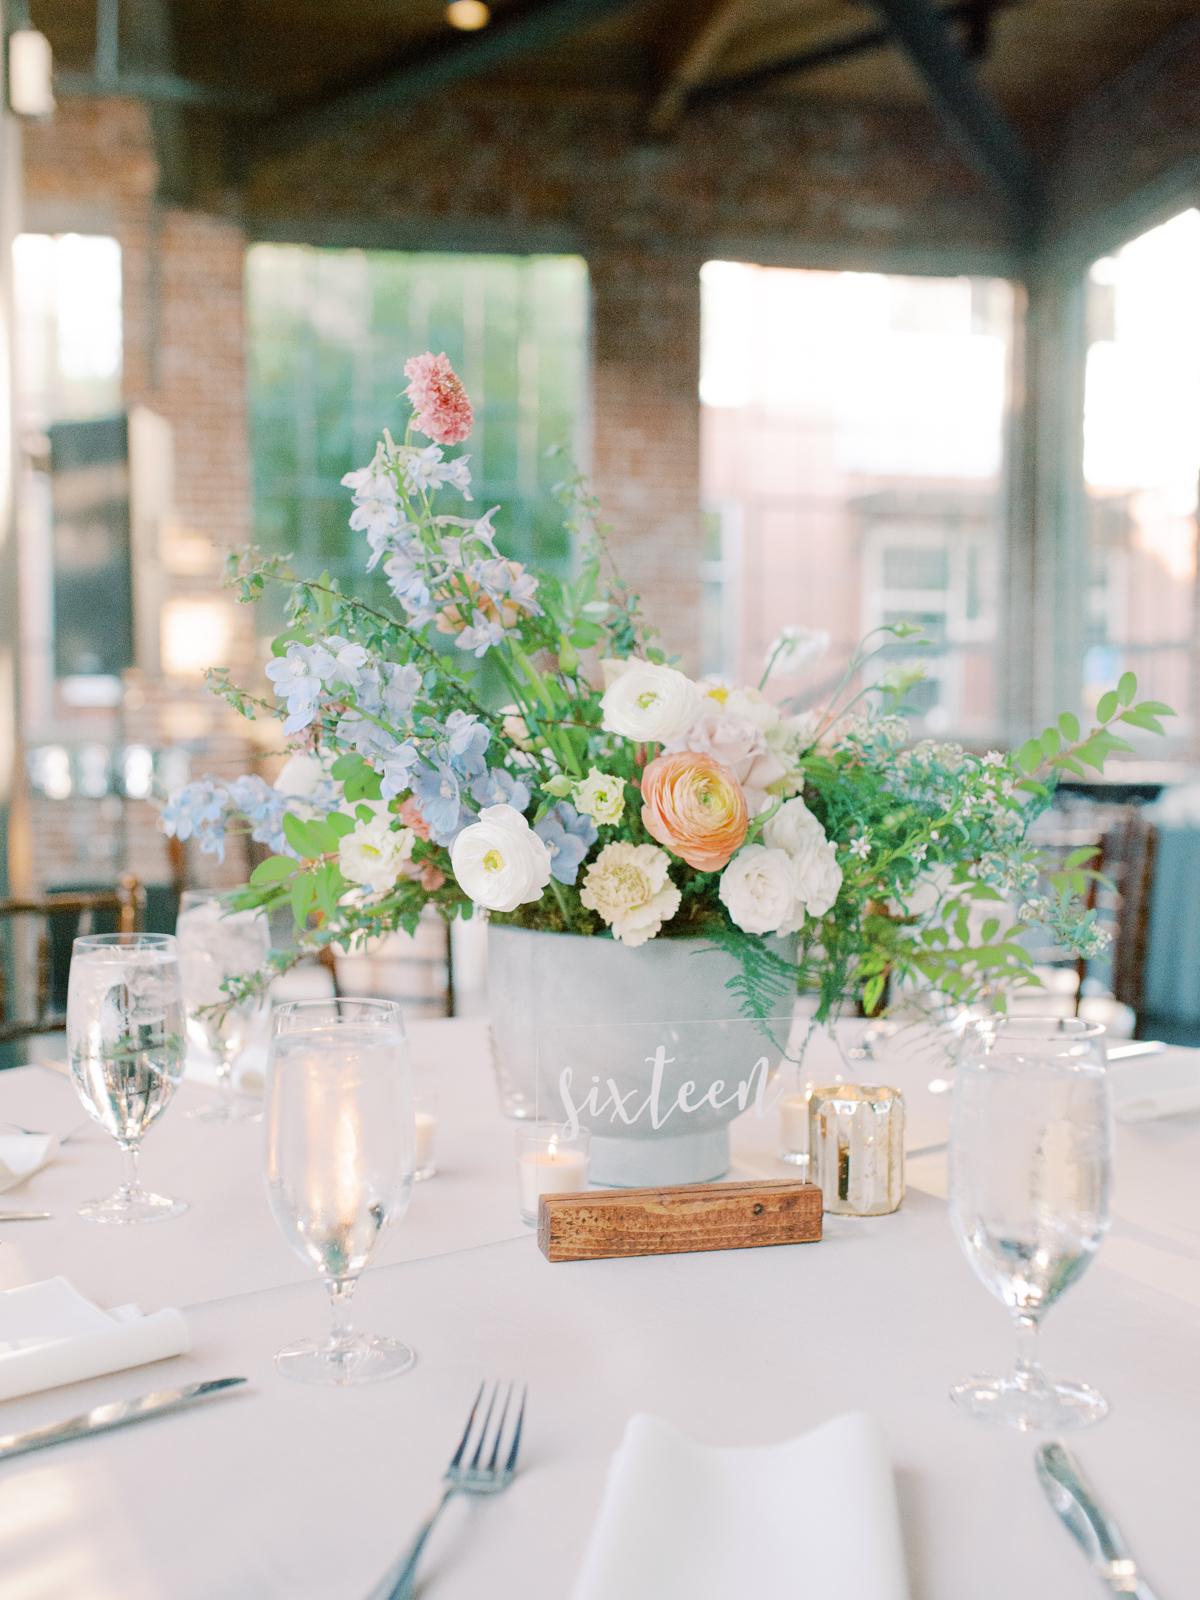 Foundry-At-Puritan-Mill-wedding-photos-venue-atlanta-fine-art-film-photographer57.JPG